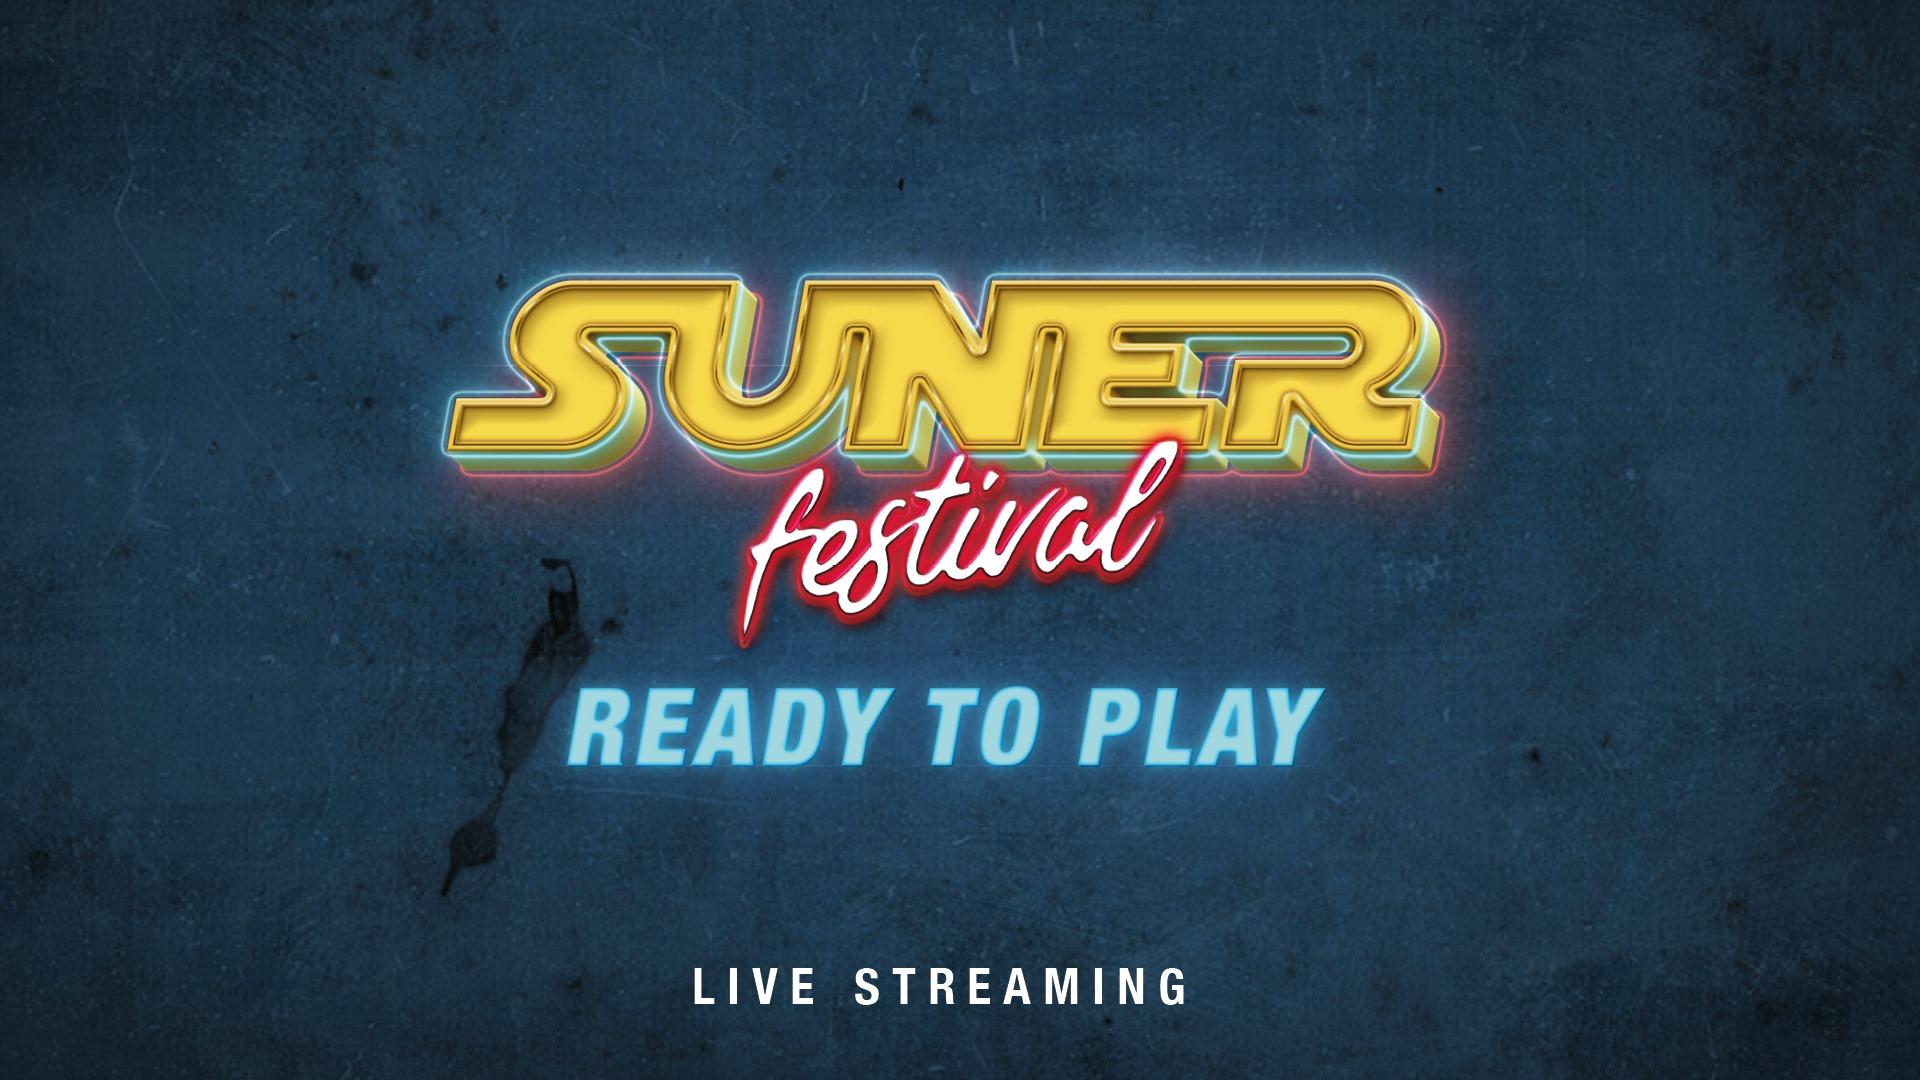 Suner Ready